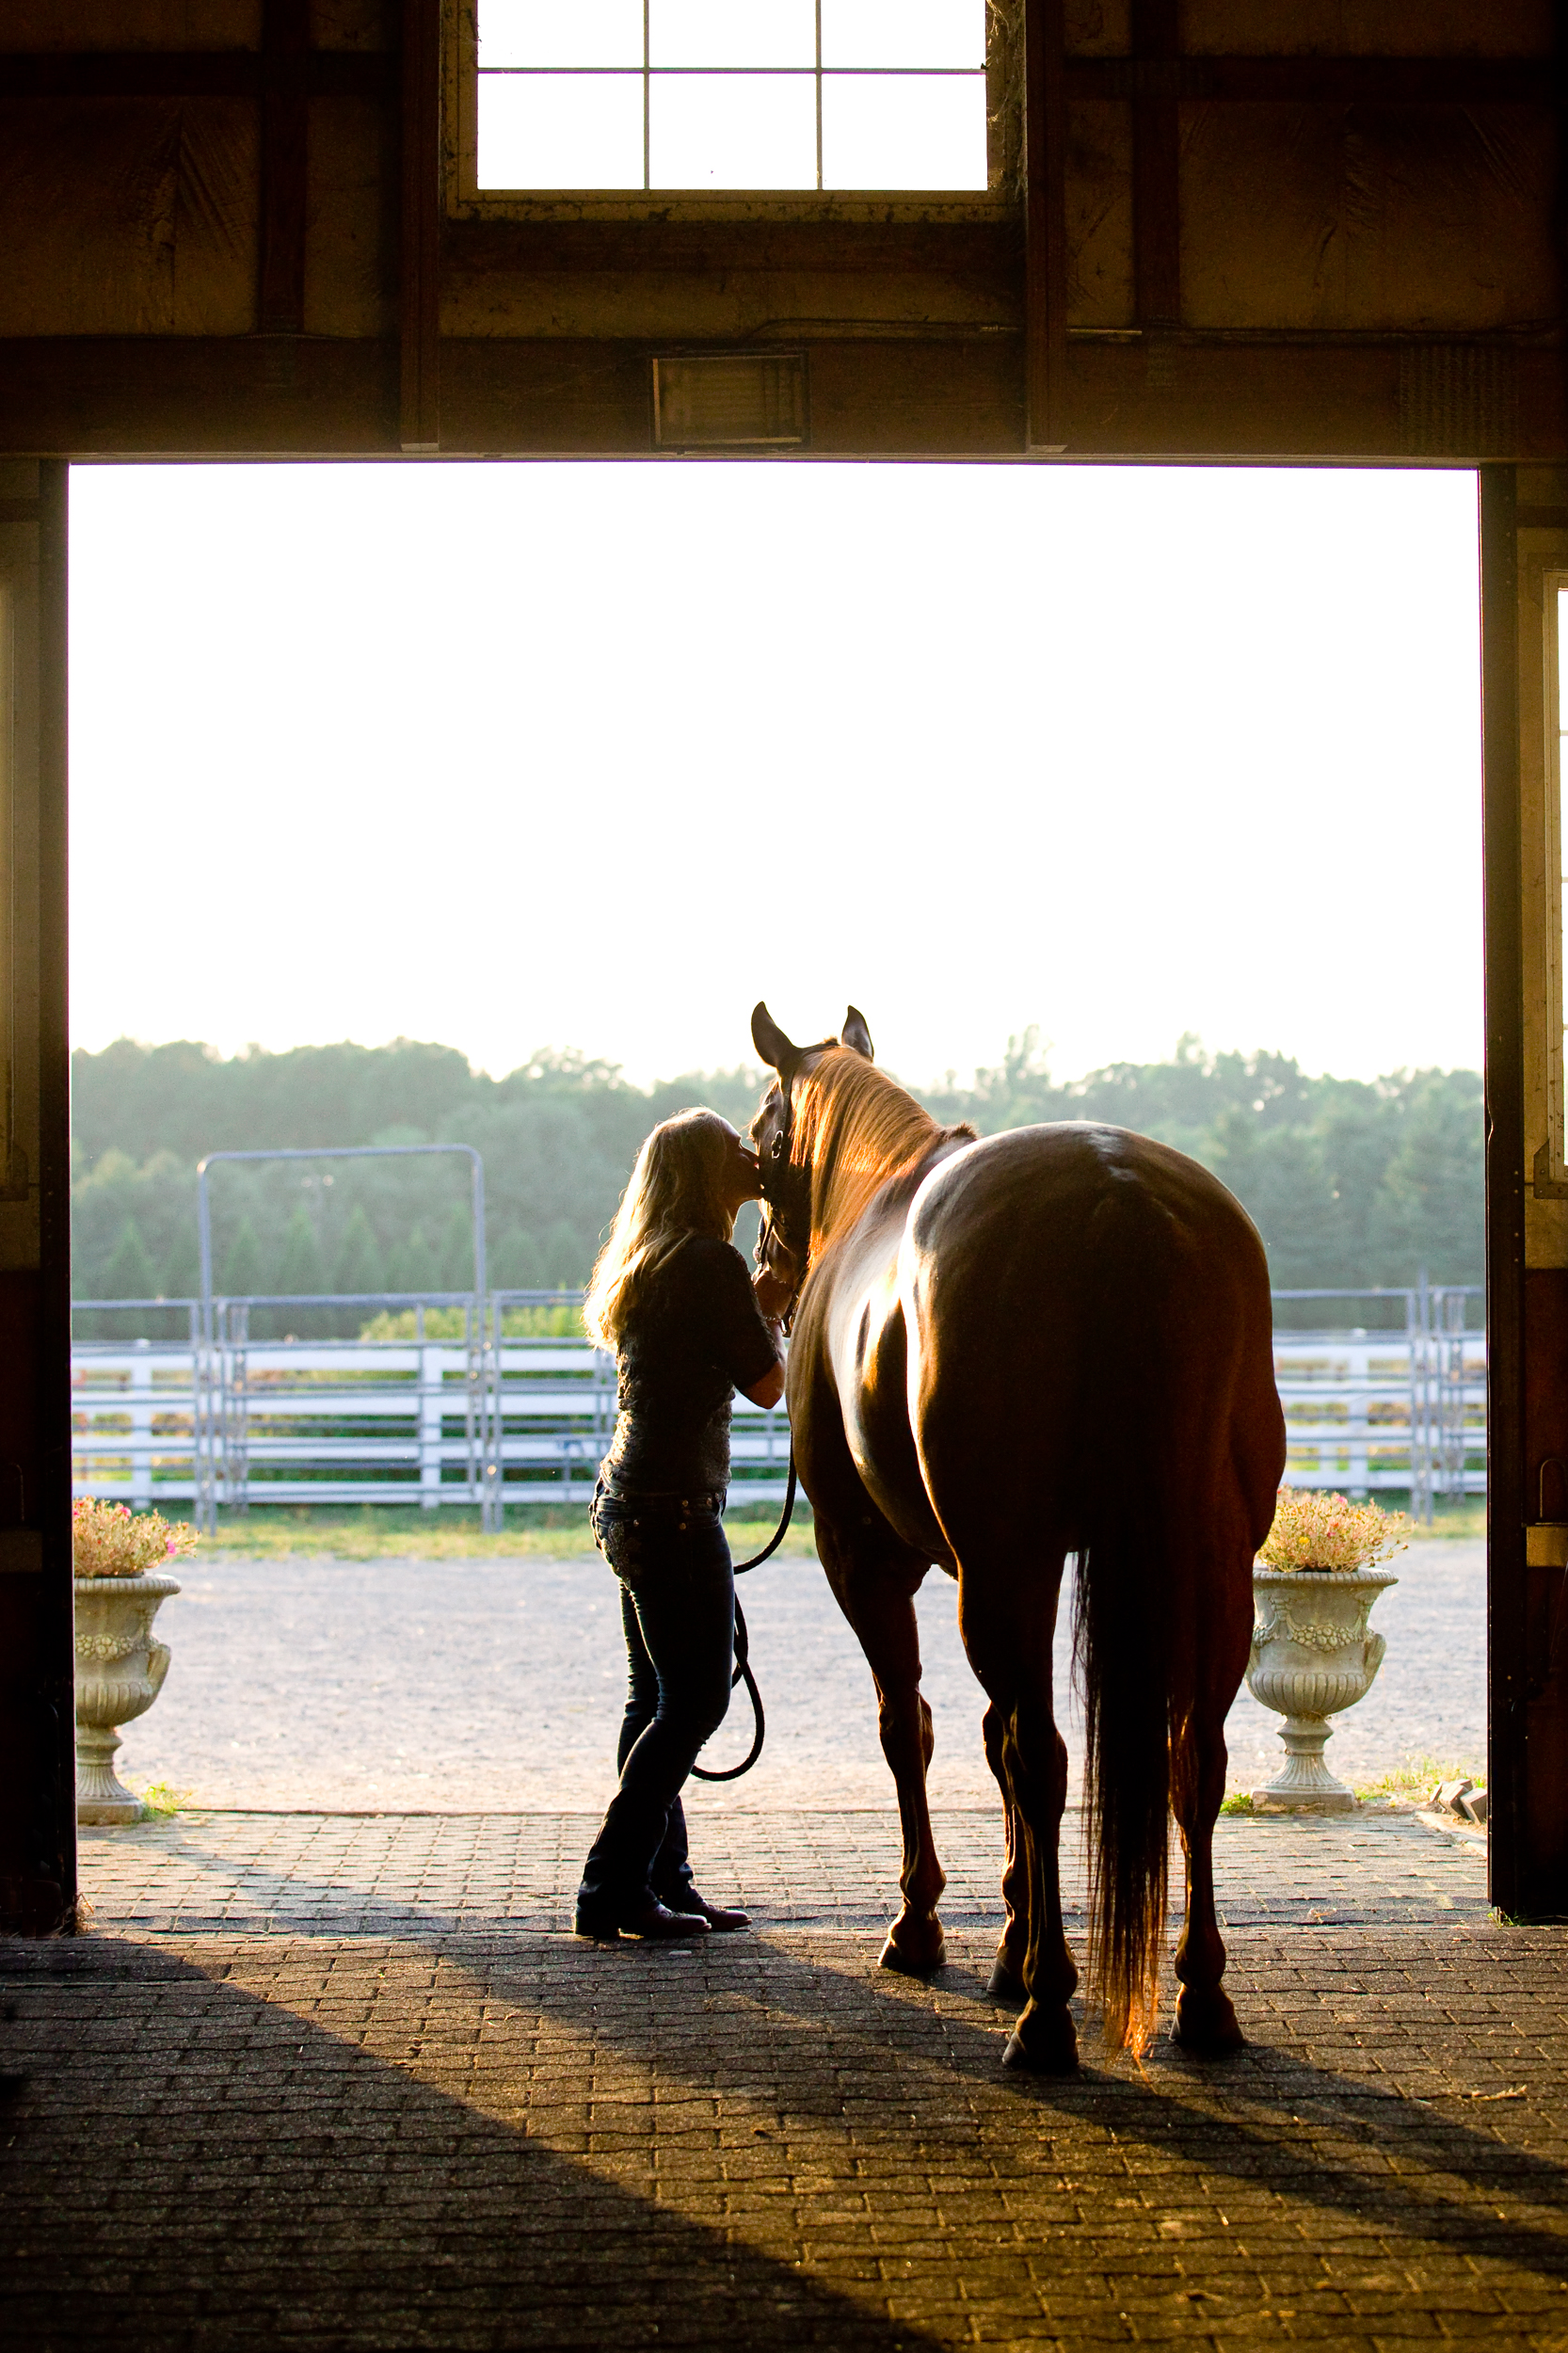 bethanygracephoto-equine-photography-maryland-virginia-31.JPG